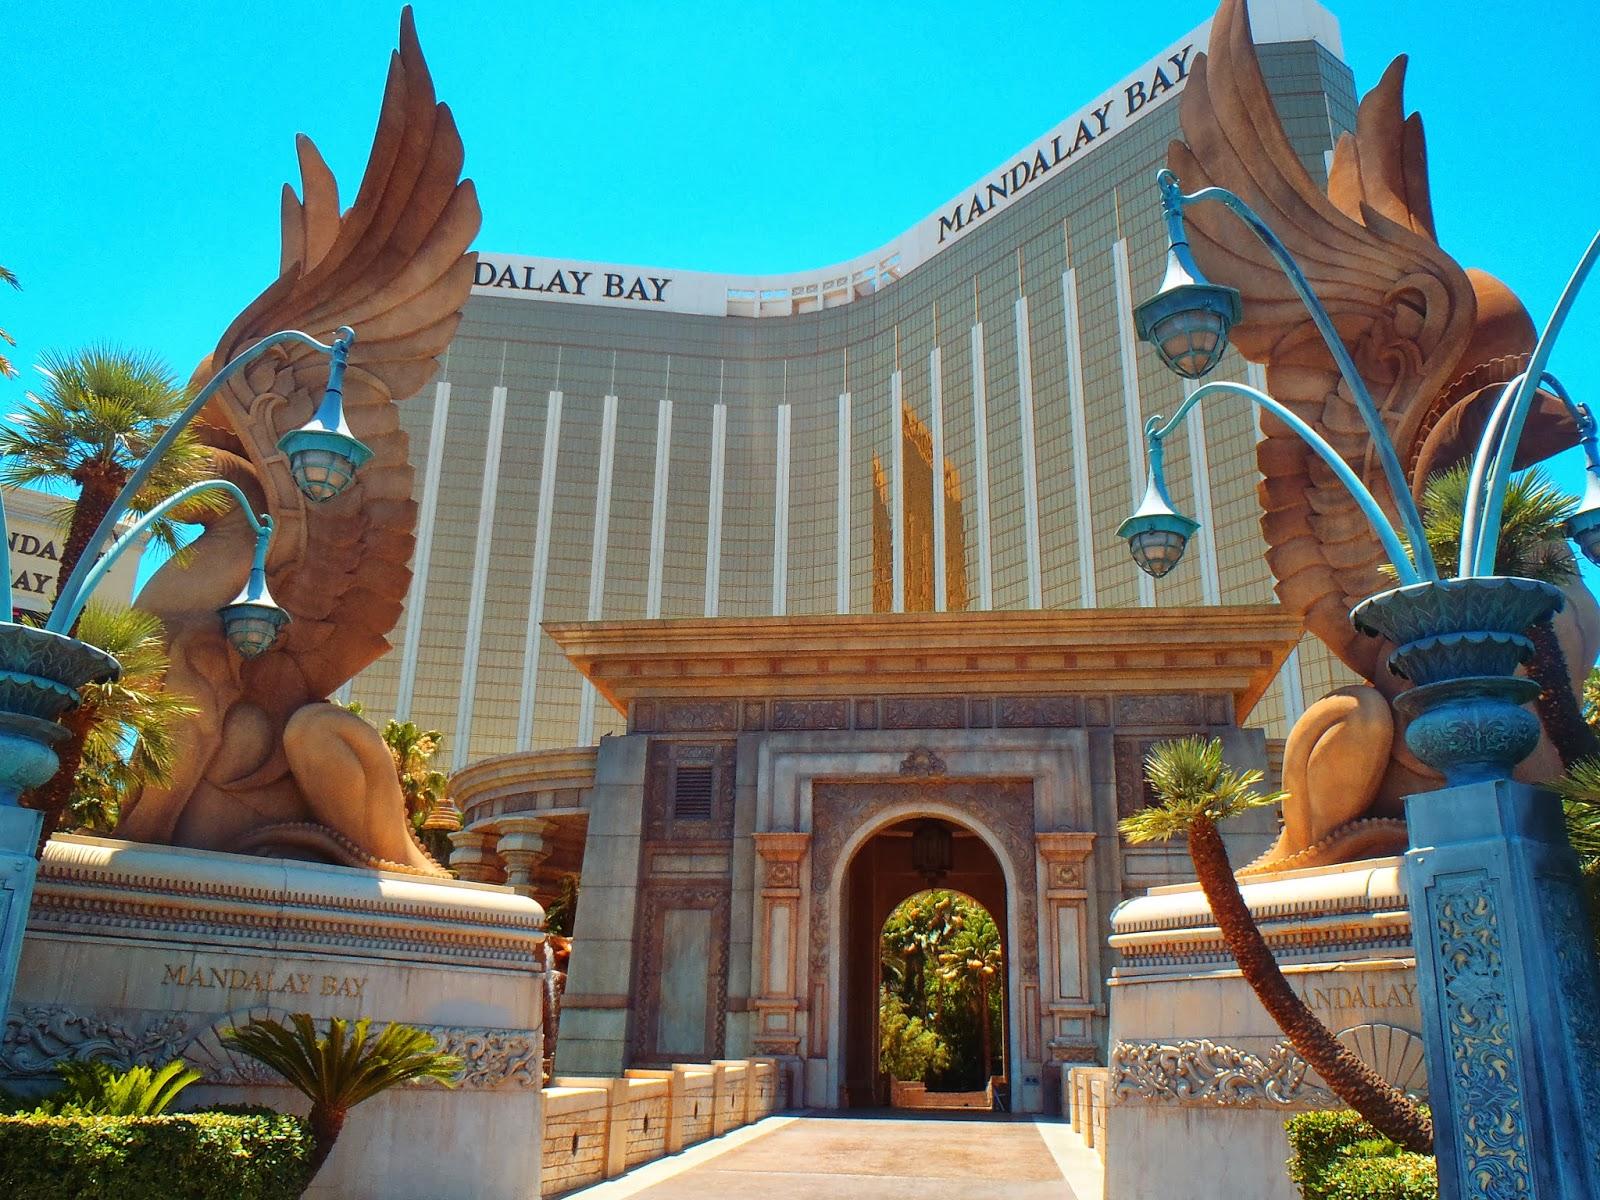 the stunning Mandalay Bay Hotel in Las Vegas